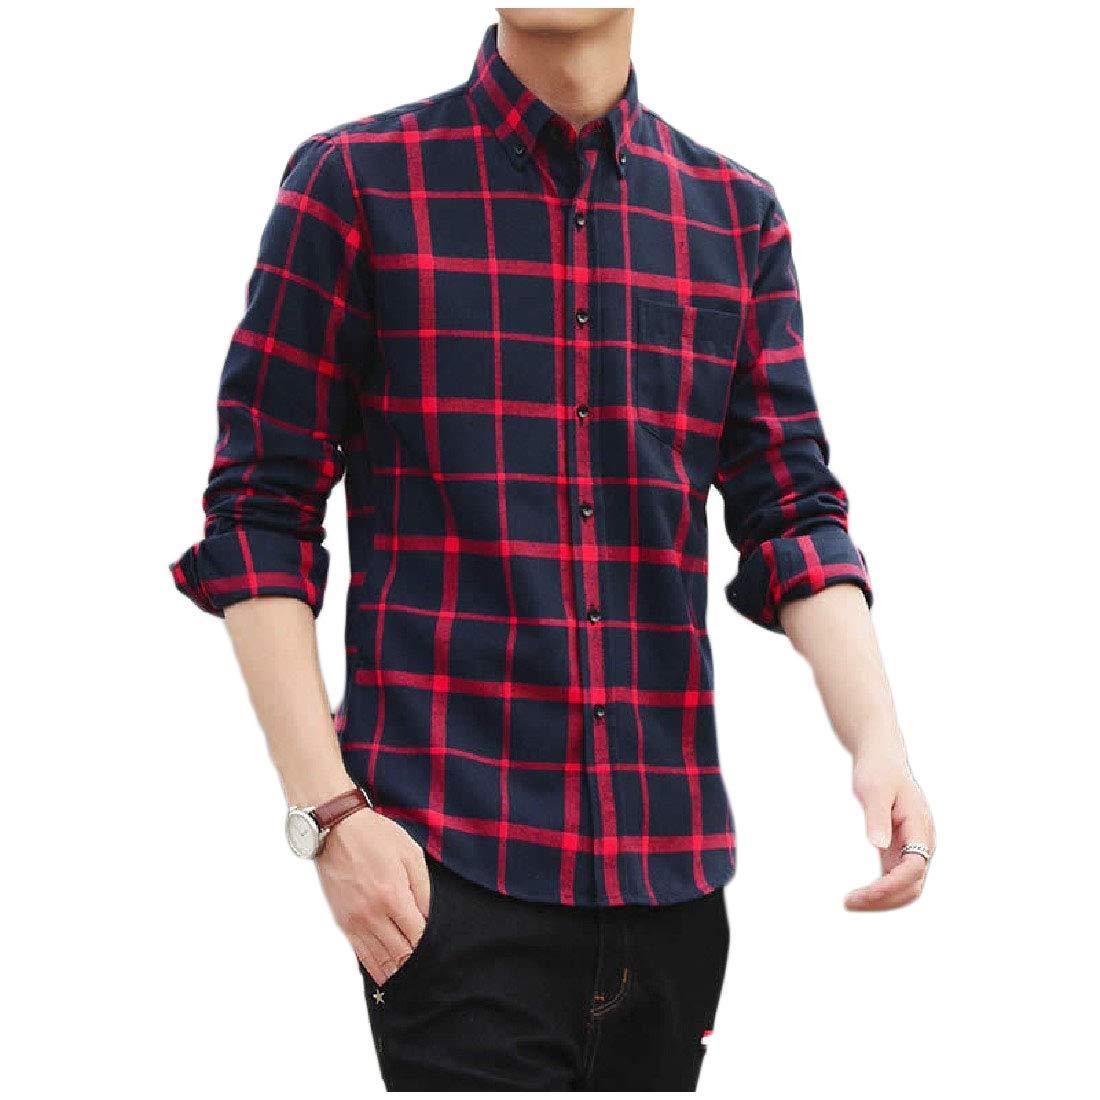 Winwinus Mens Flannel Small Plaid Leisure Button Down Long Sleeve Shirt